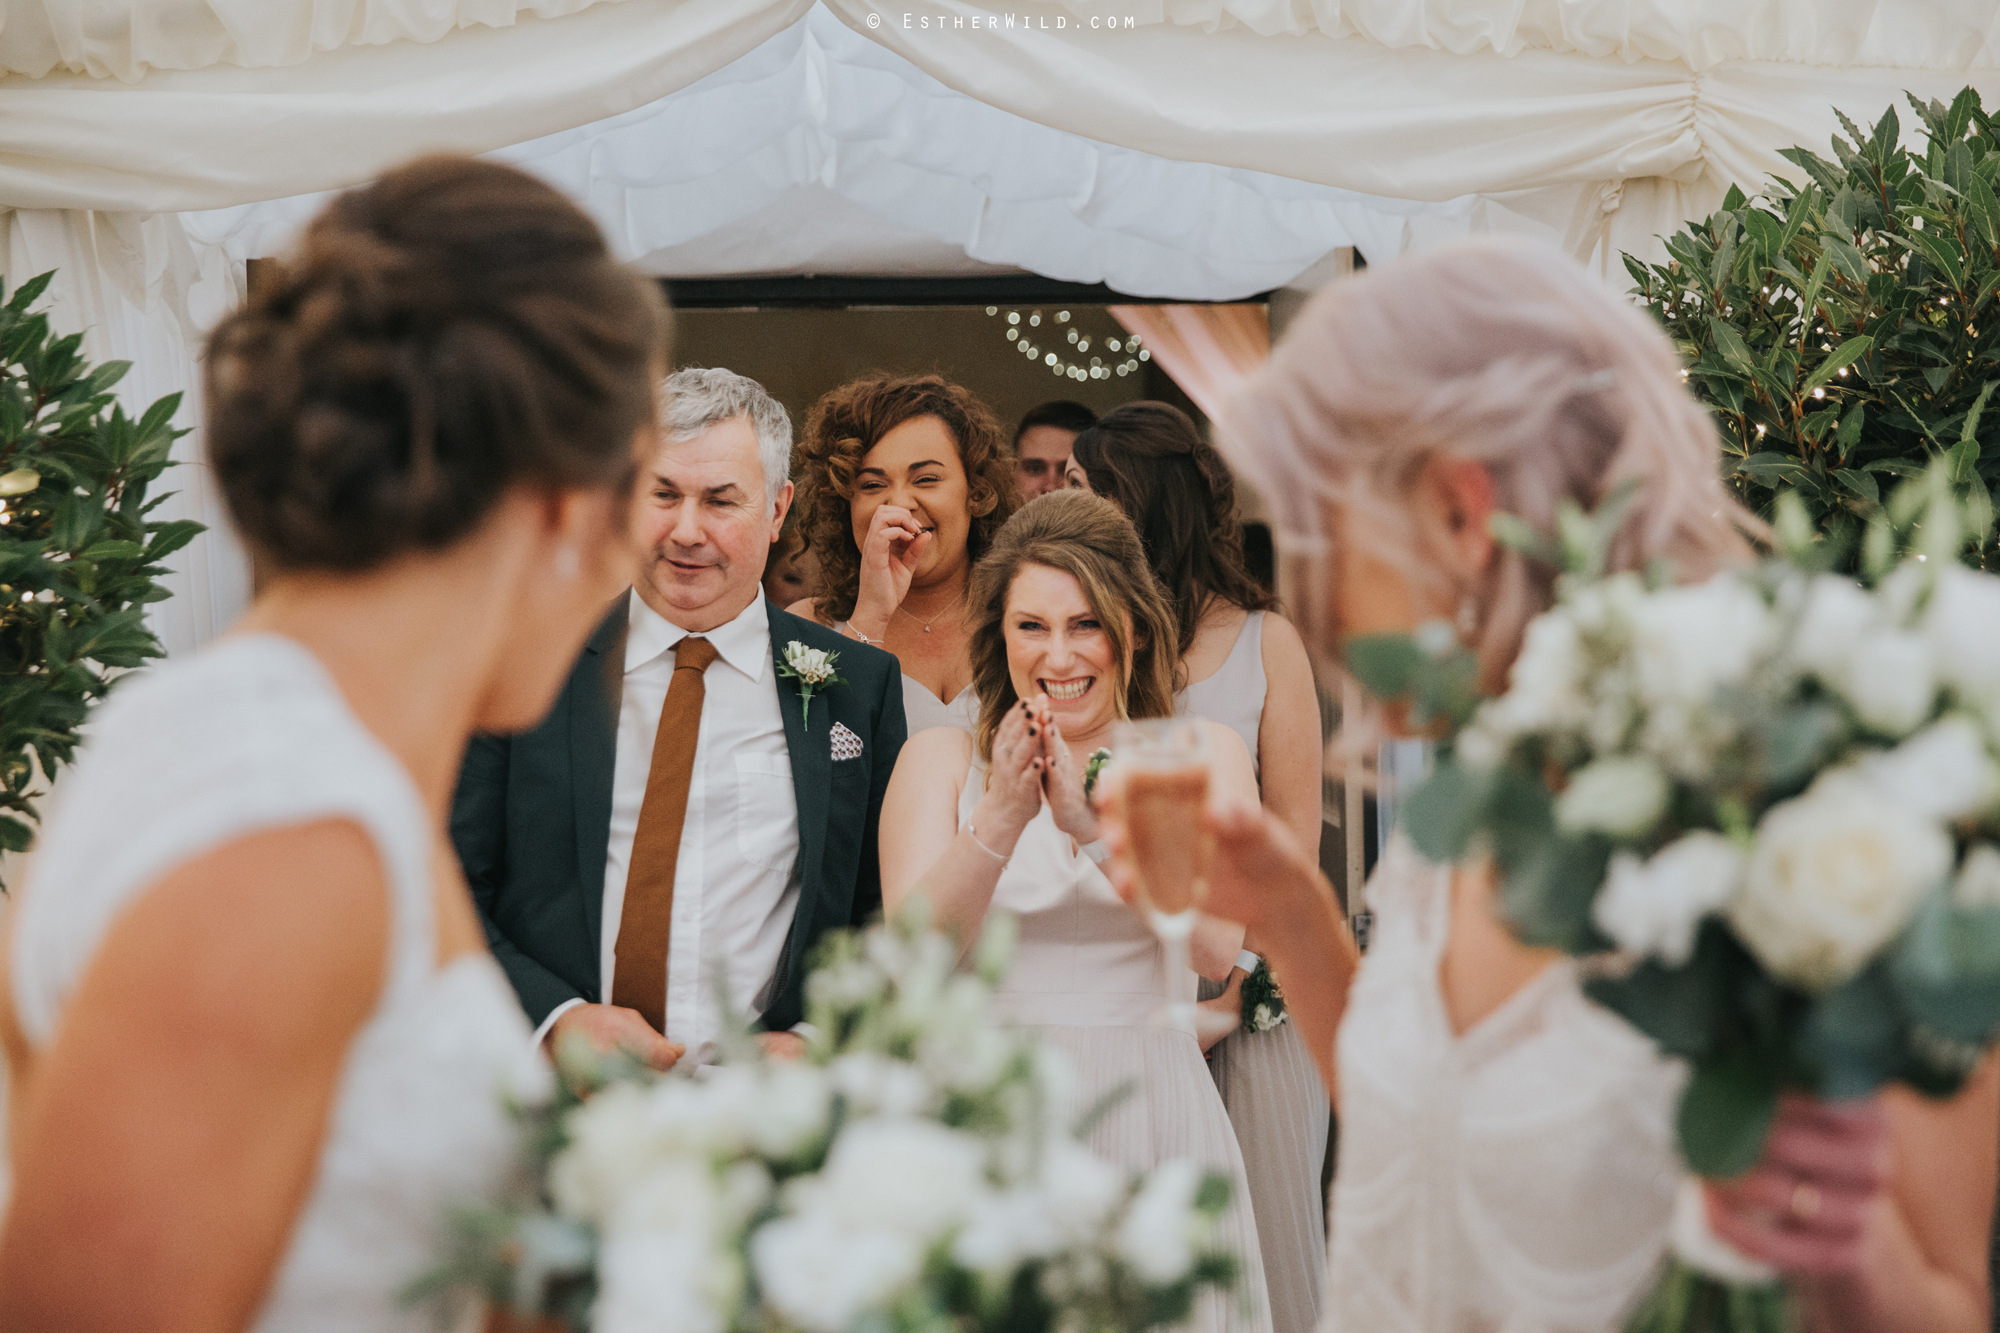 Elms_Barn_Weddings_Suffolk_Photographer_Copyright_Esther_Wild_IMG_1427.jpg